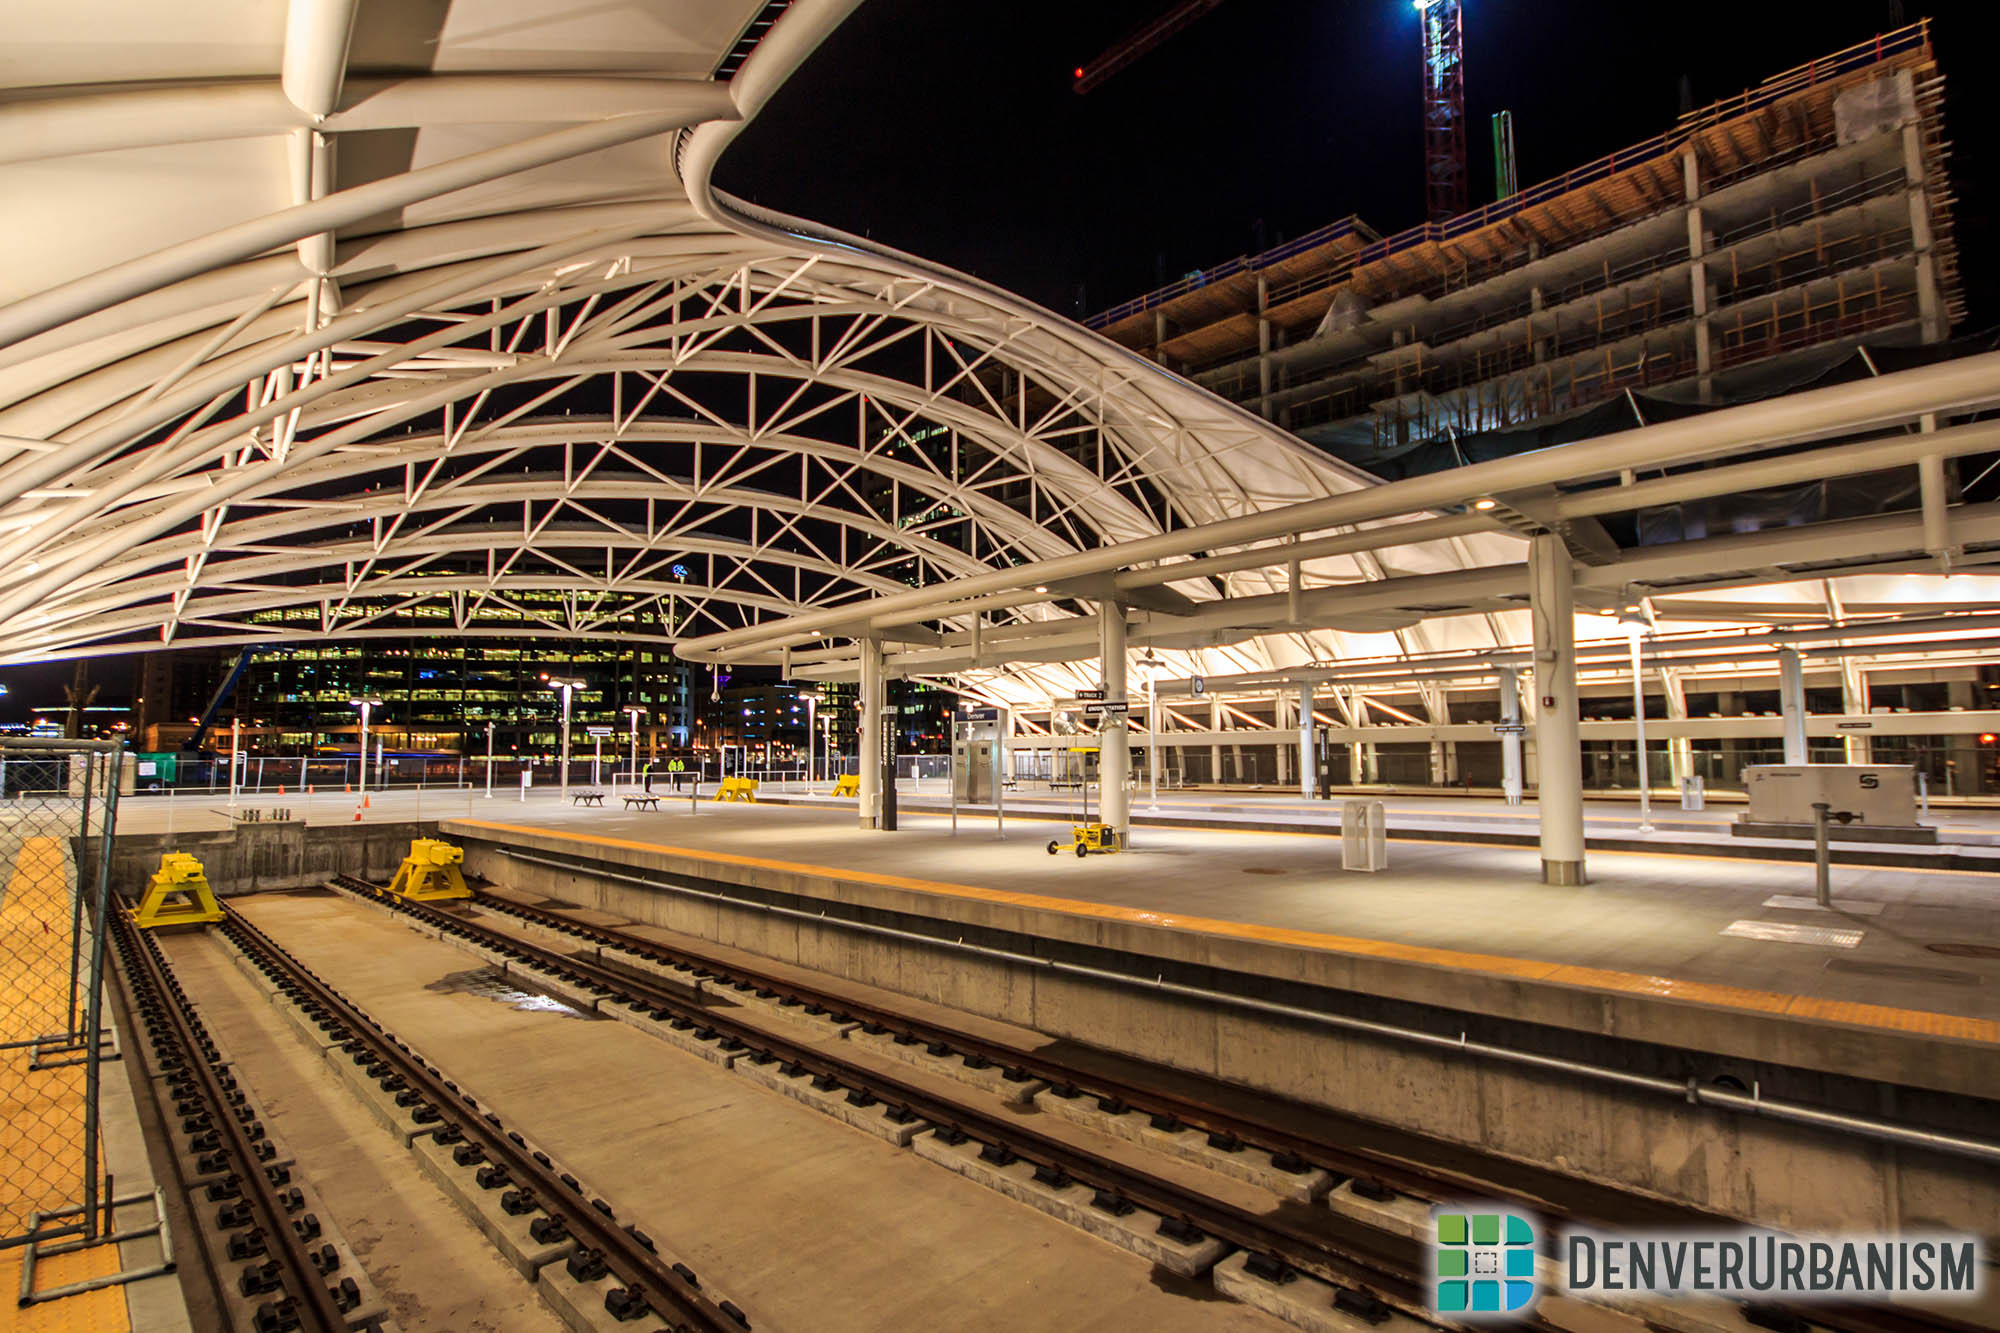 Denver amtrak station photo